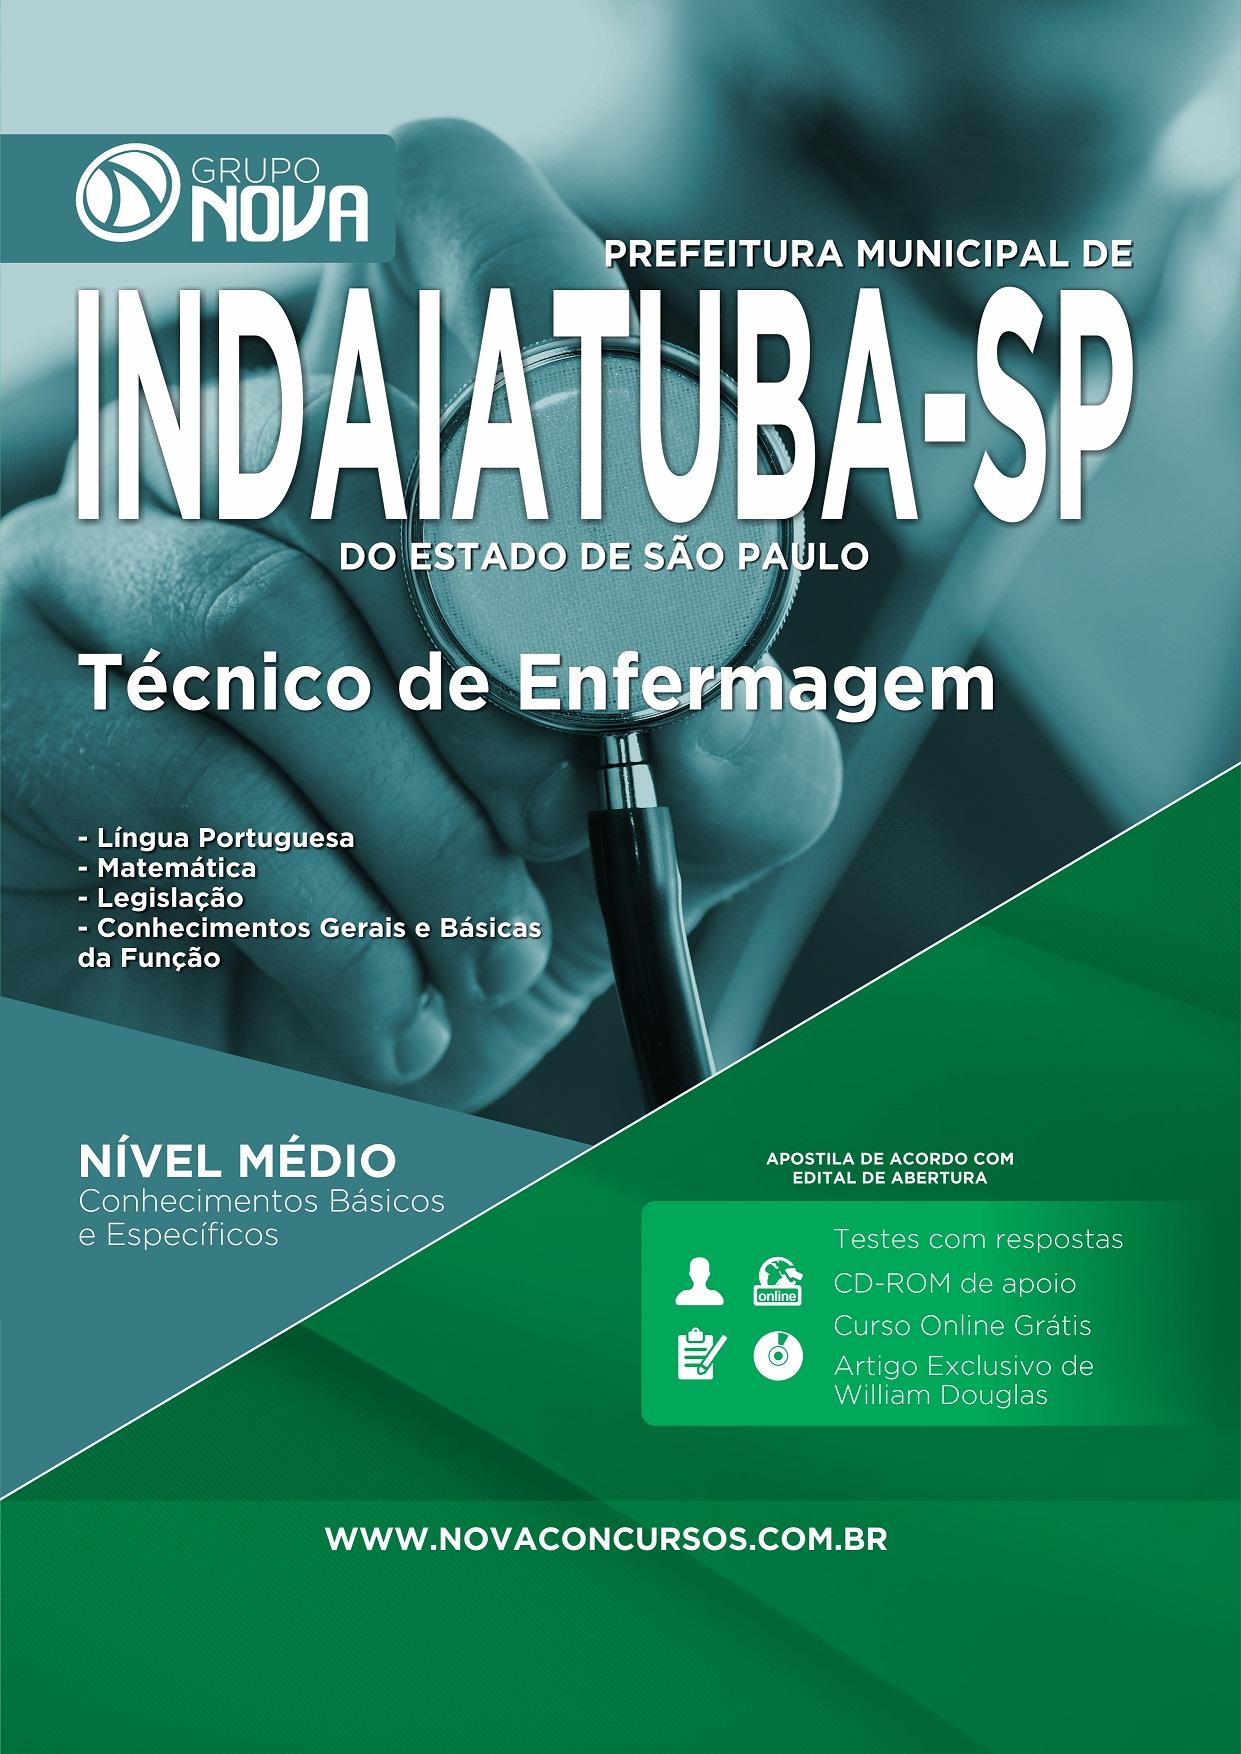 Apostila Prefeitura de Indaiatuba - Técnico de Enfermagem (Impressa)